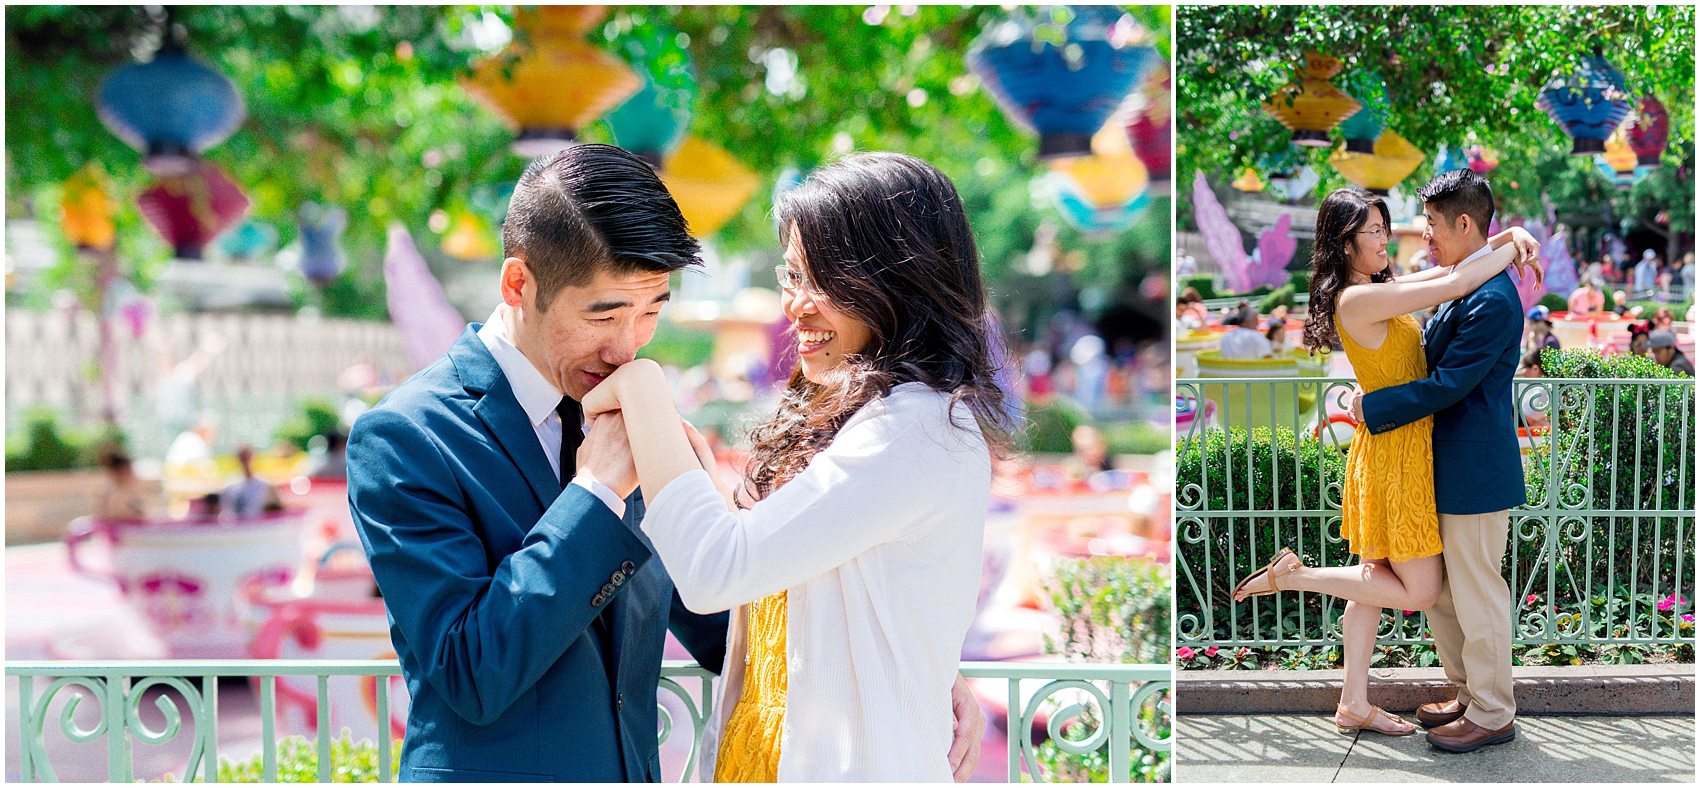 Disneyland Engagement Photography Smetona Photo Bonnie Tim-0002.jpg